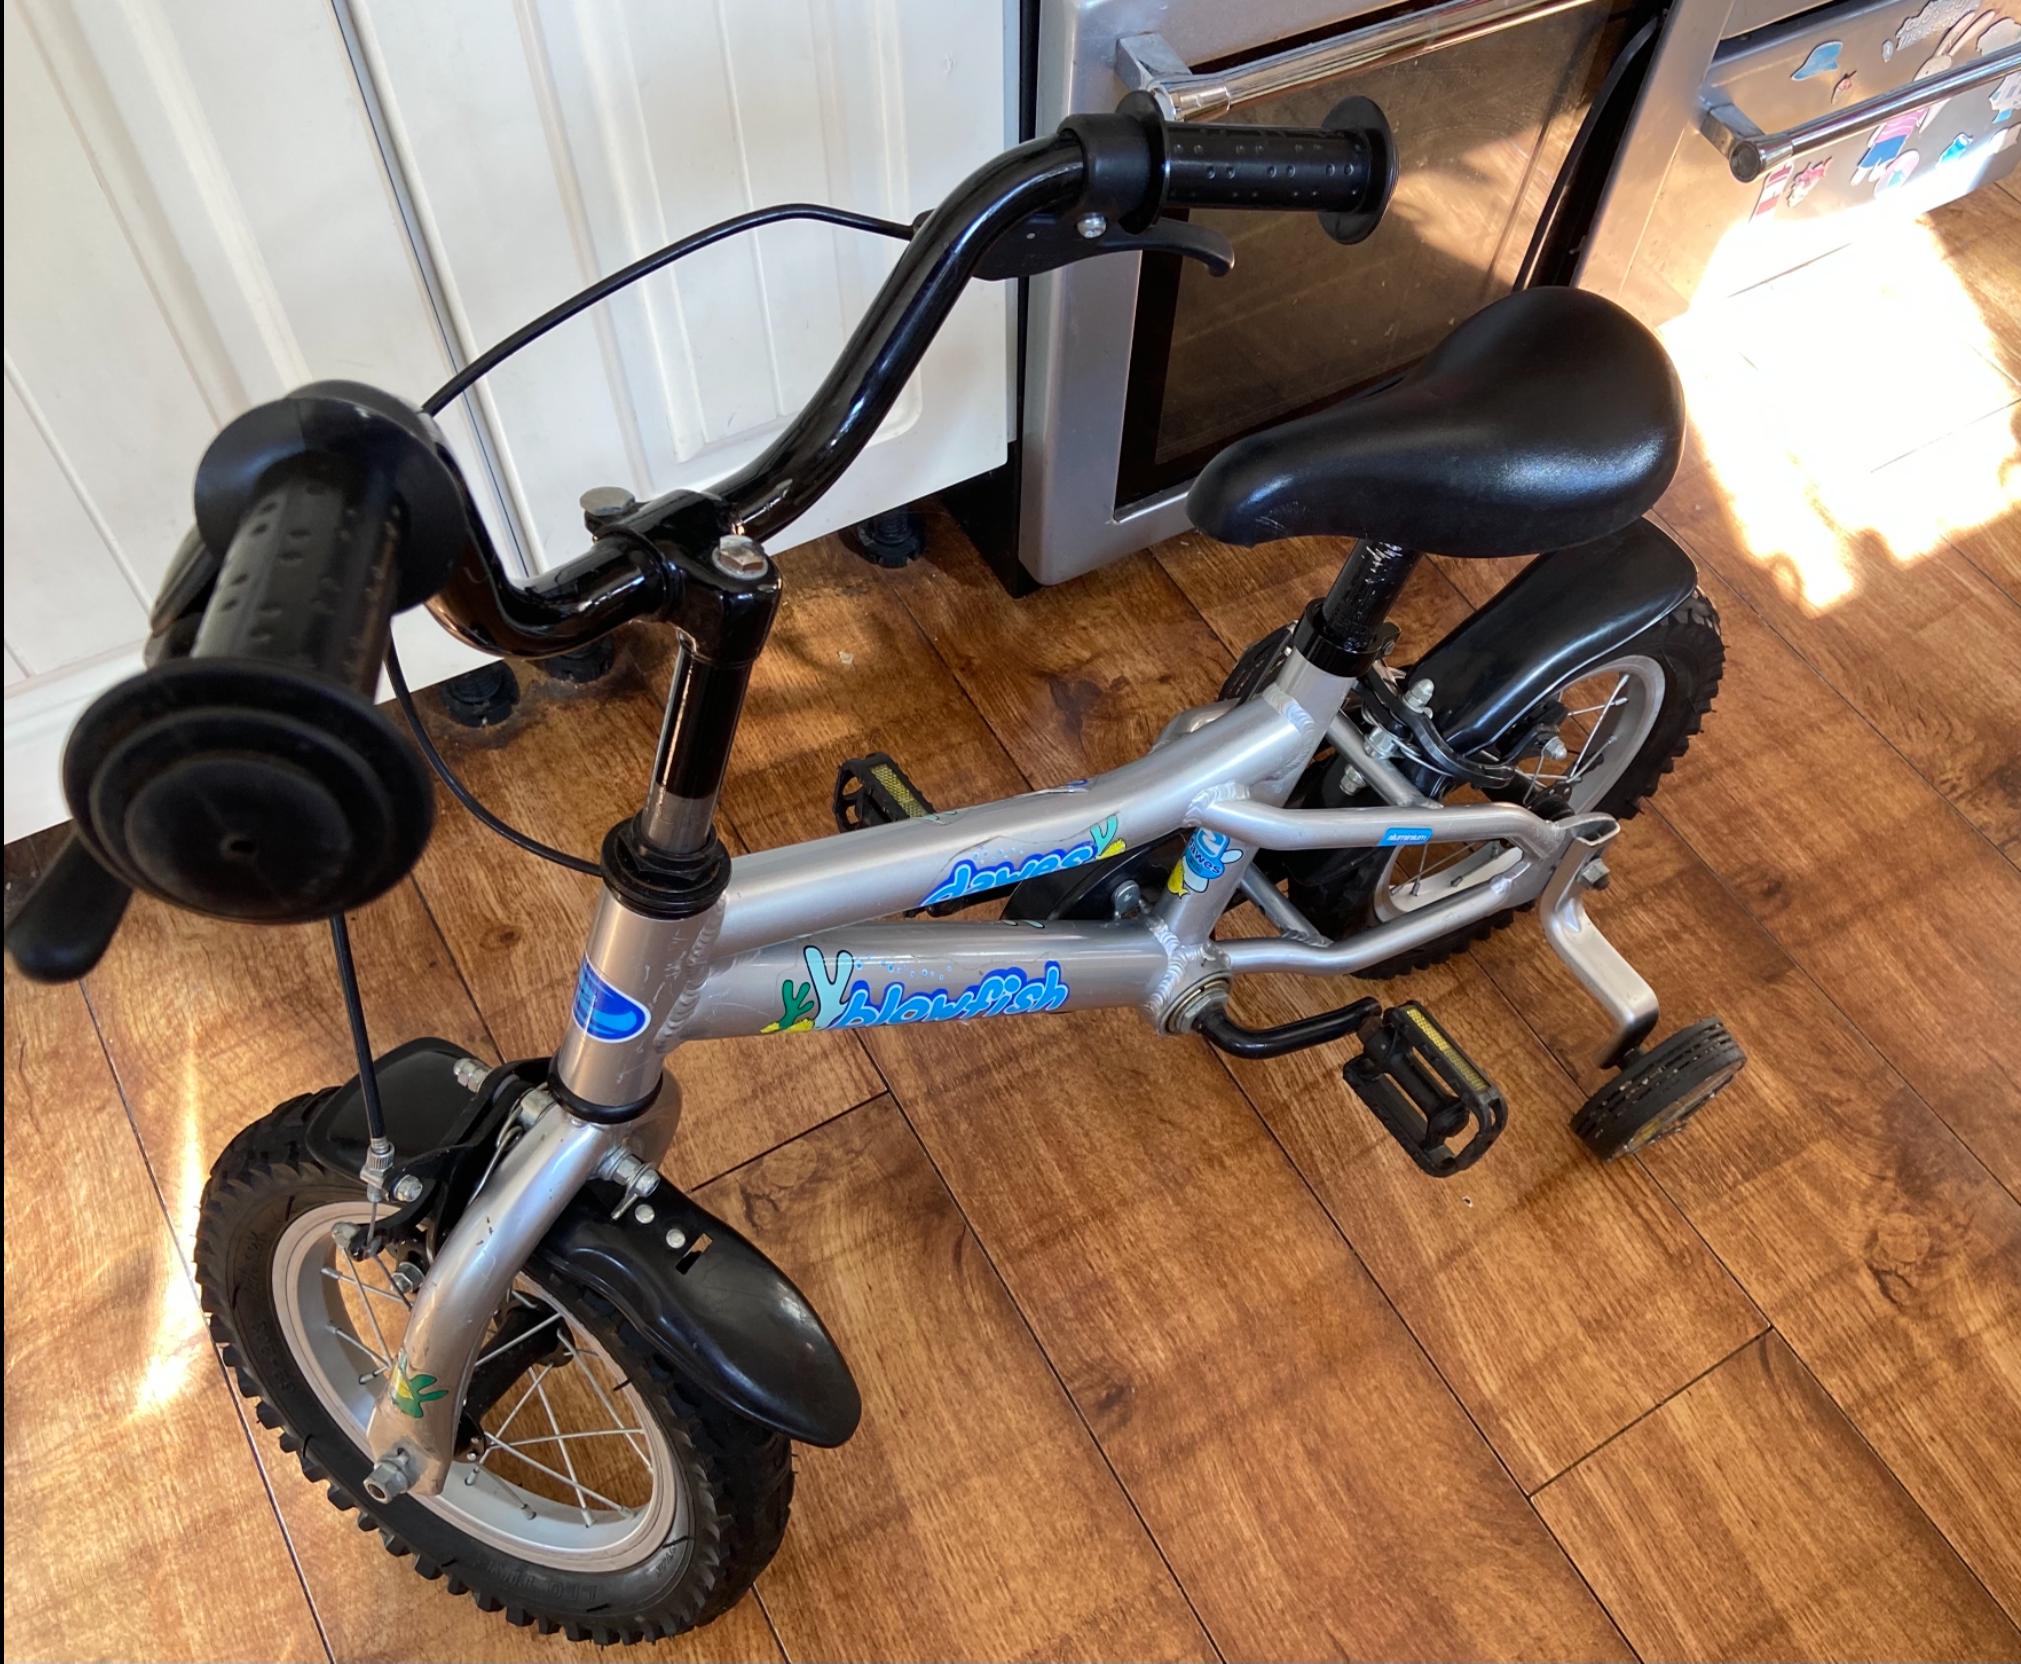 Dawes blowfish 12 inch wheel bike with stabilisers